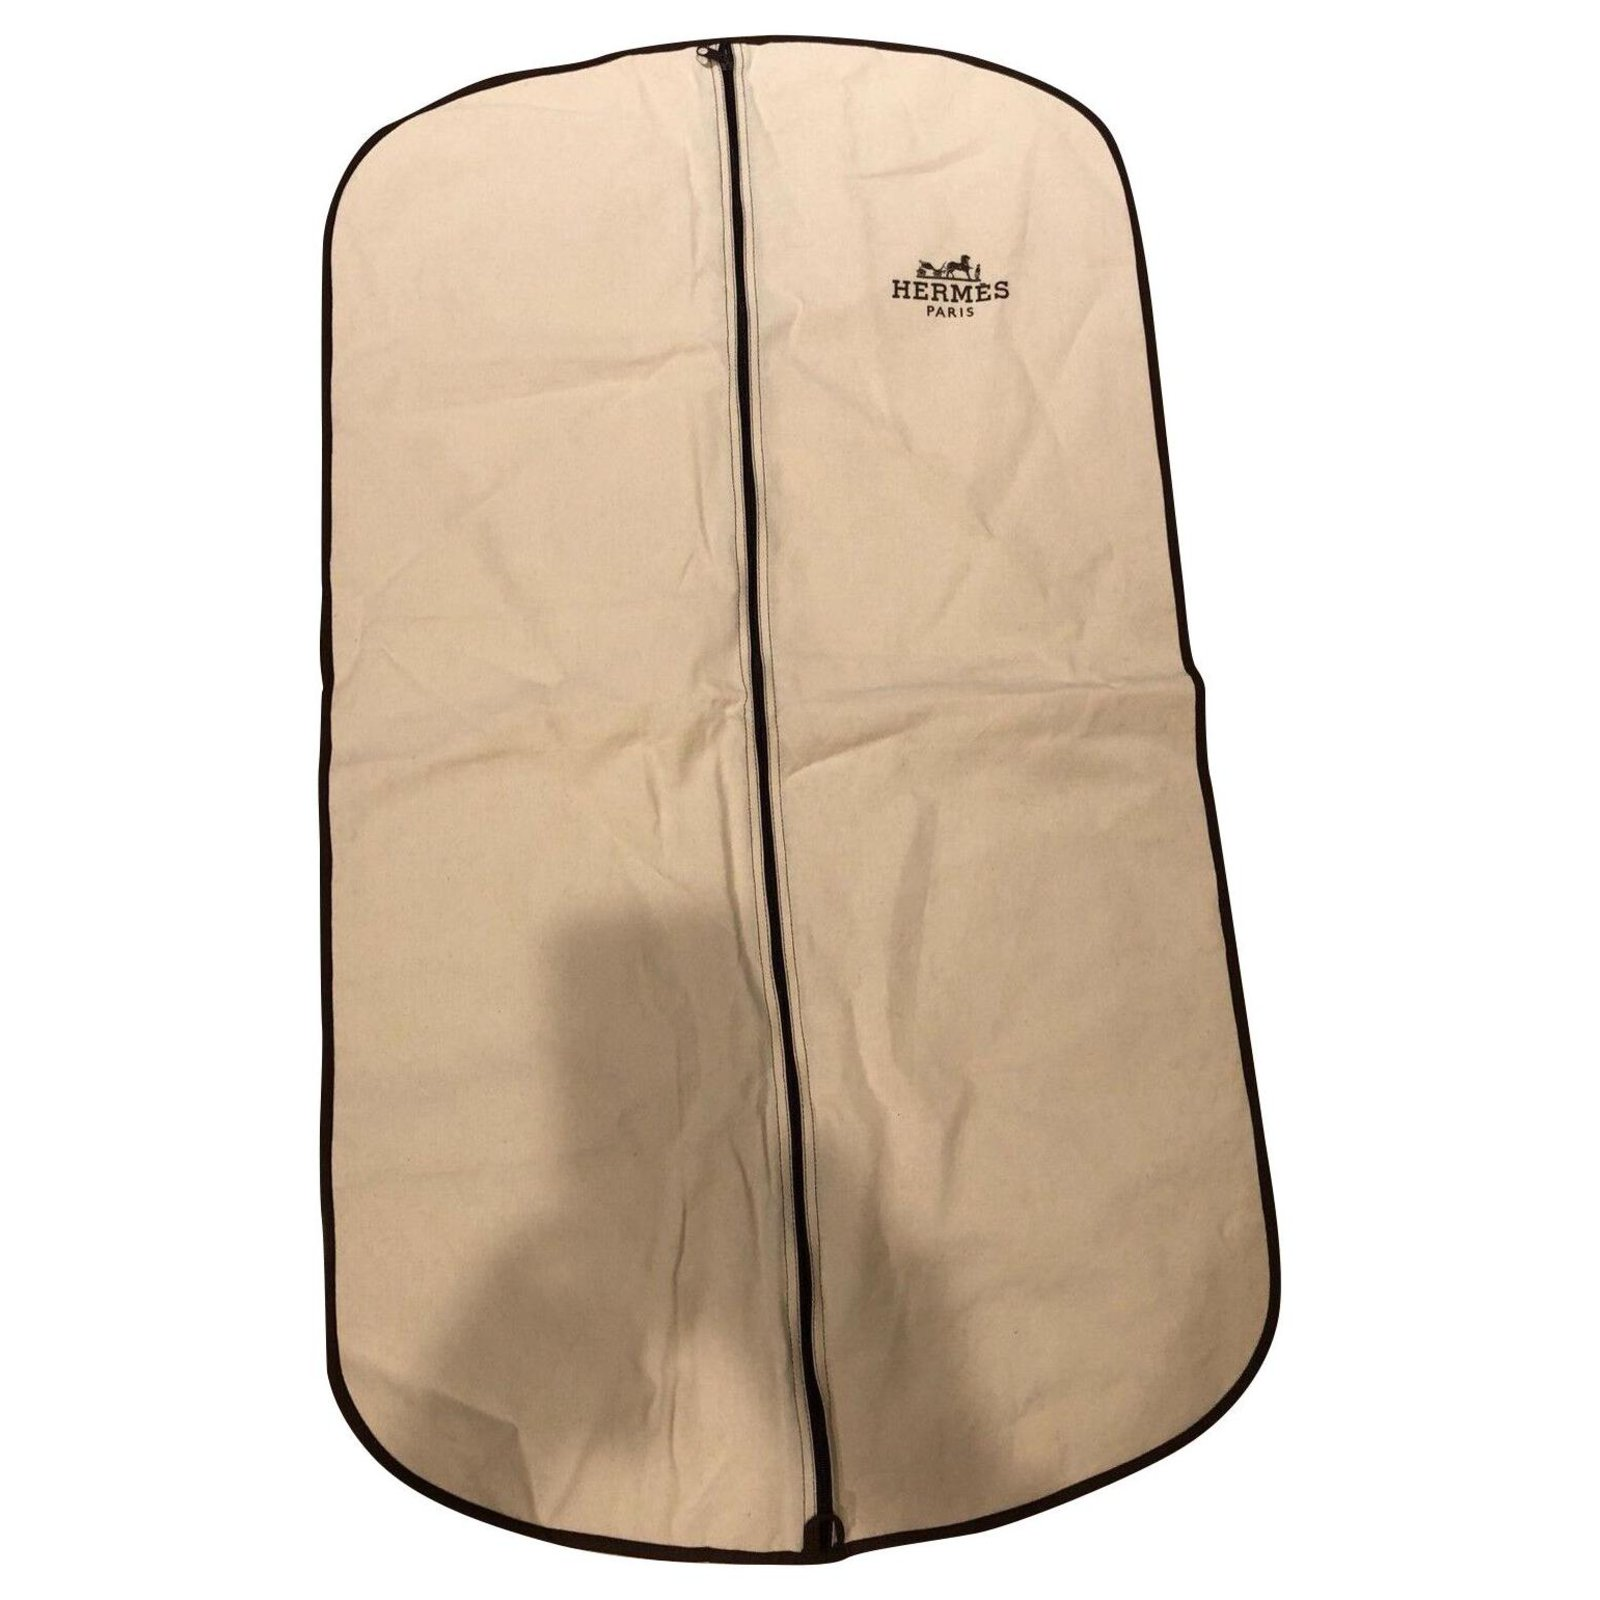 Hermes Protect Suit Wallets Small Accessories Cotton White Ref 130371 Joli Closet